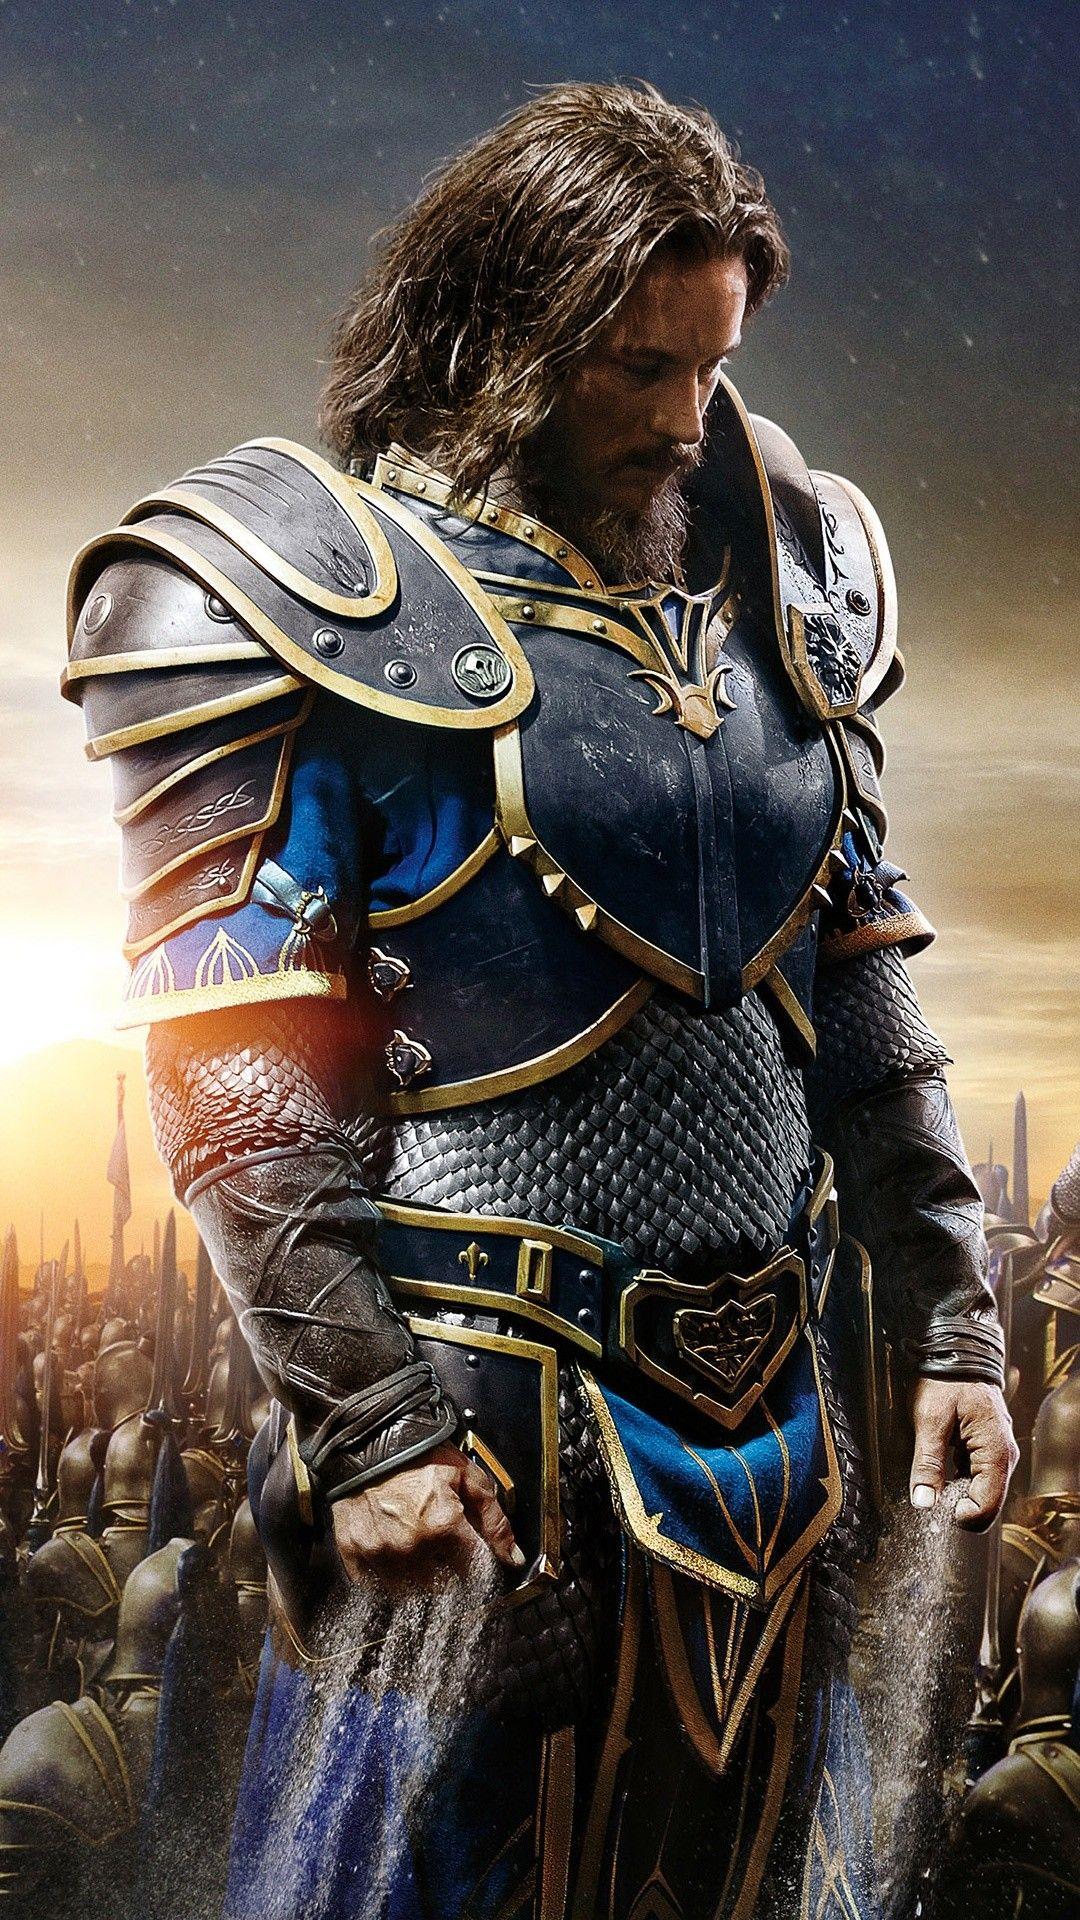 1080x1920 Anduin Lothar Warcraft Lothar Warcraft Warcraft Movie World Of Warcraft Wallpaper